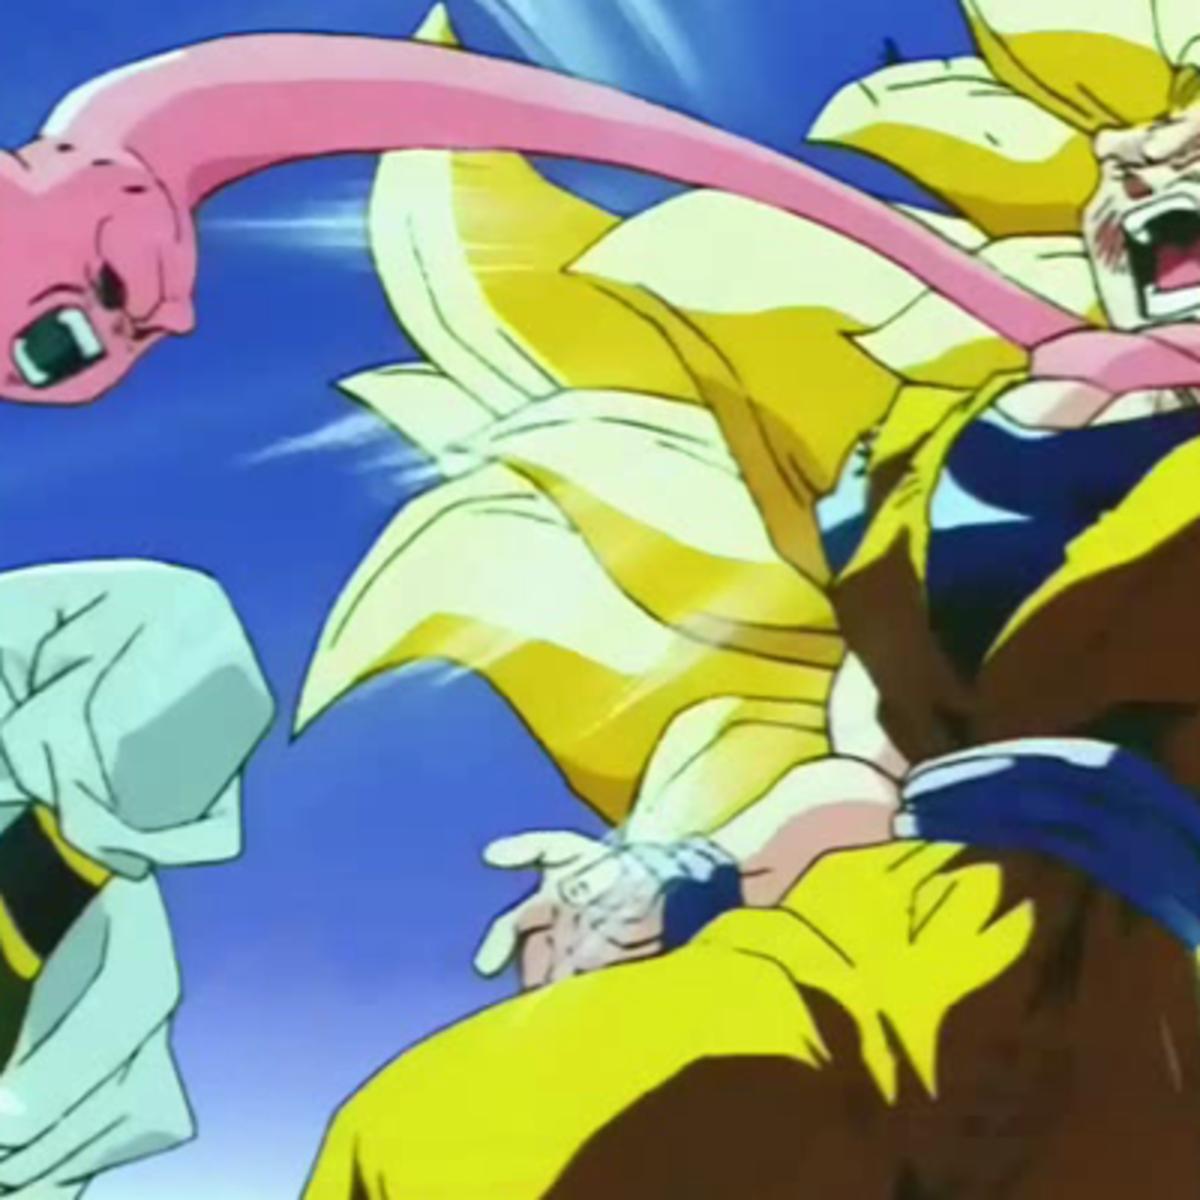 Majin Buu choking Son Goku